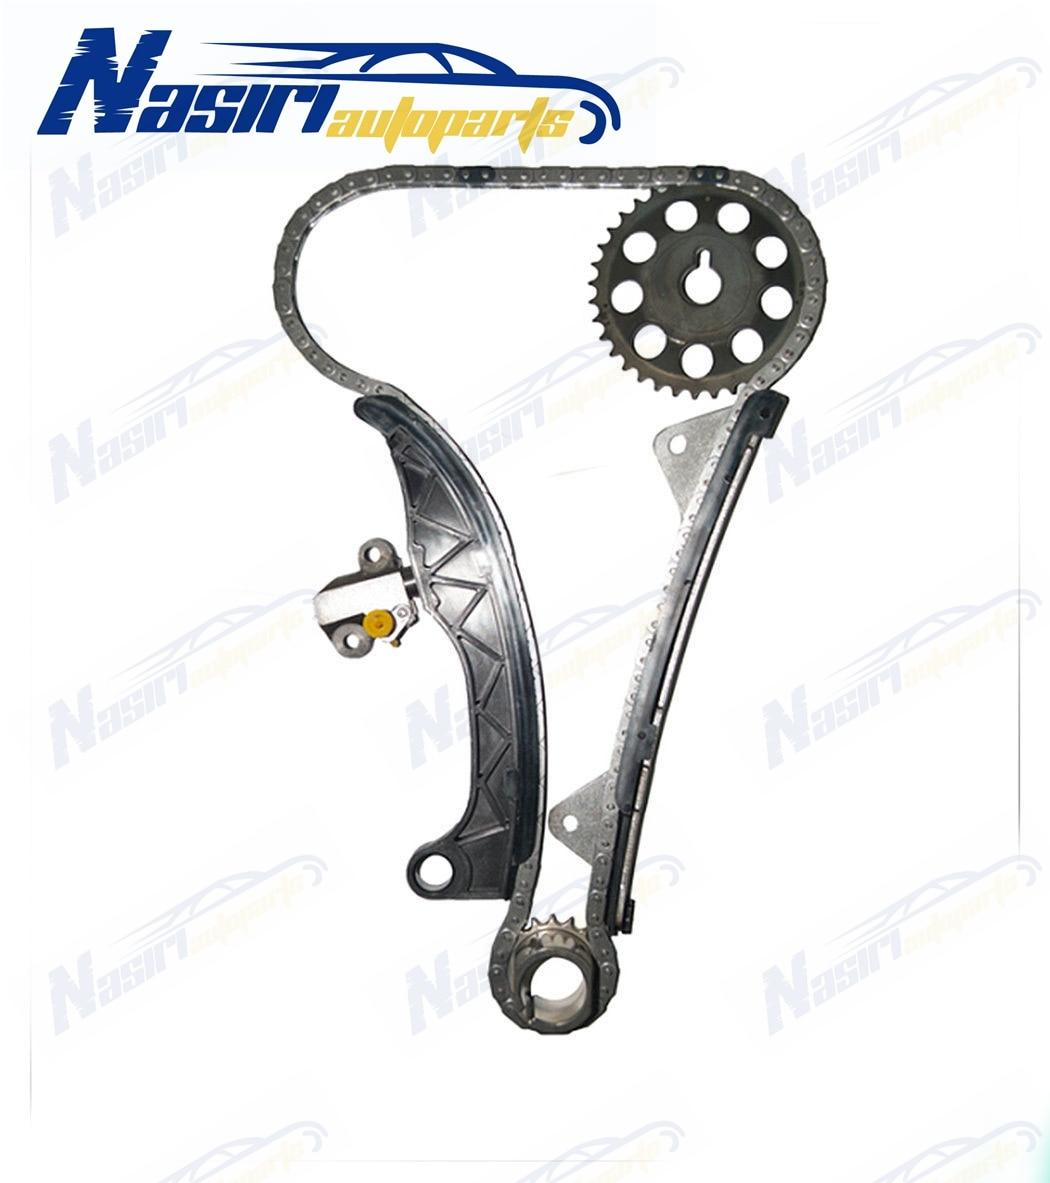 hight resolution of timing chain kit for toyota new yaris 1kr fe 1 0 aygo 1 0 05 daihatsu boon sproket